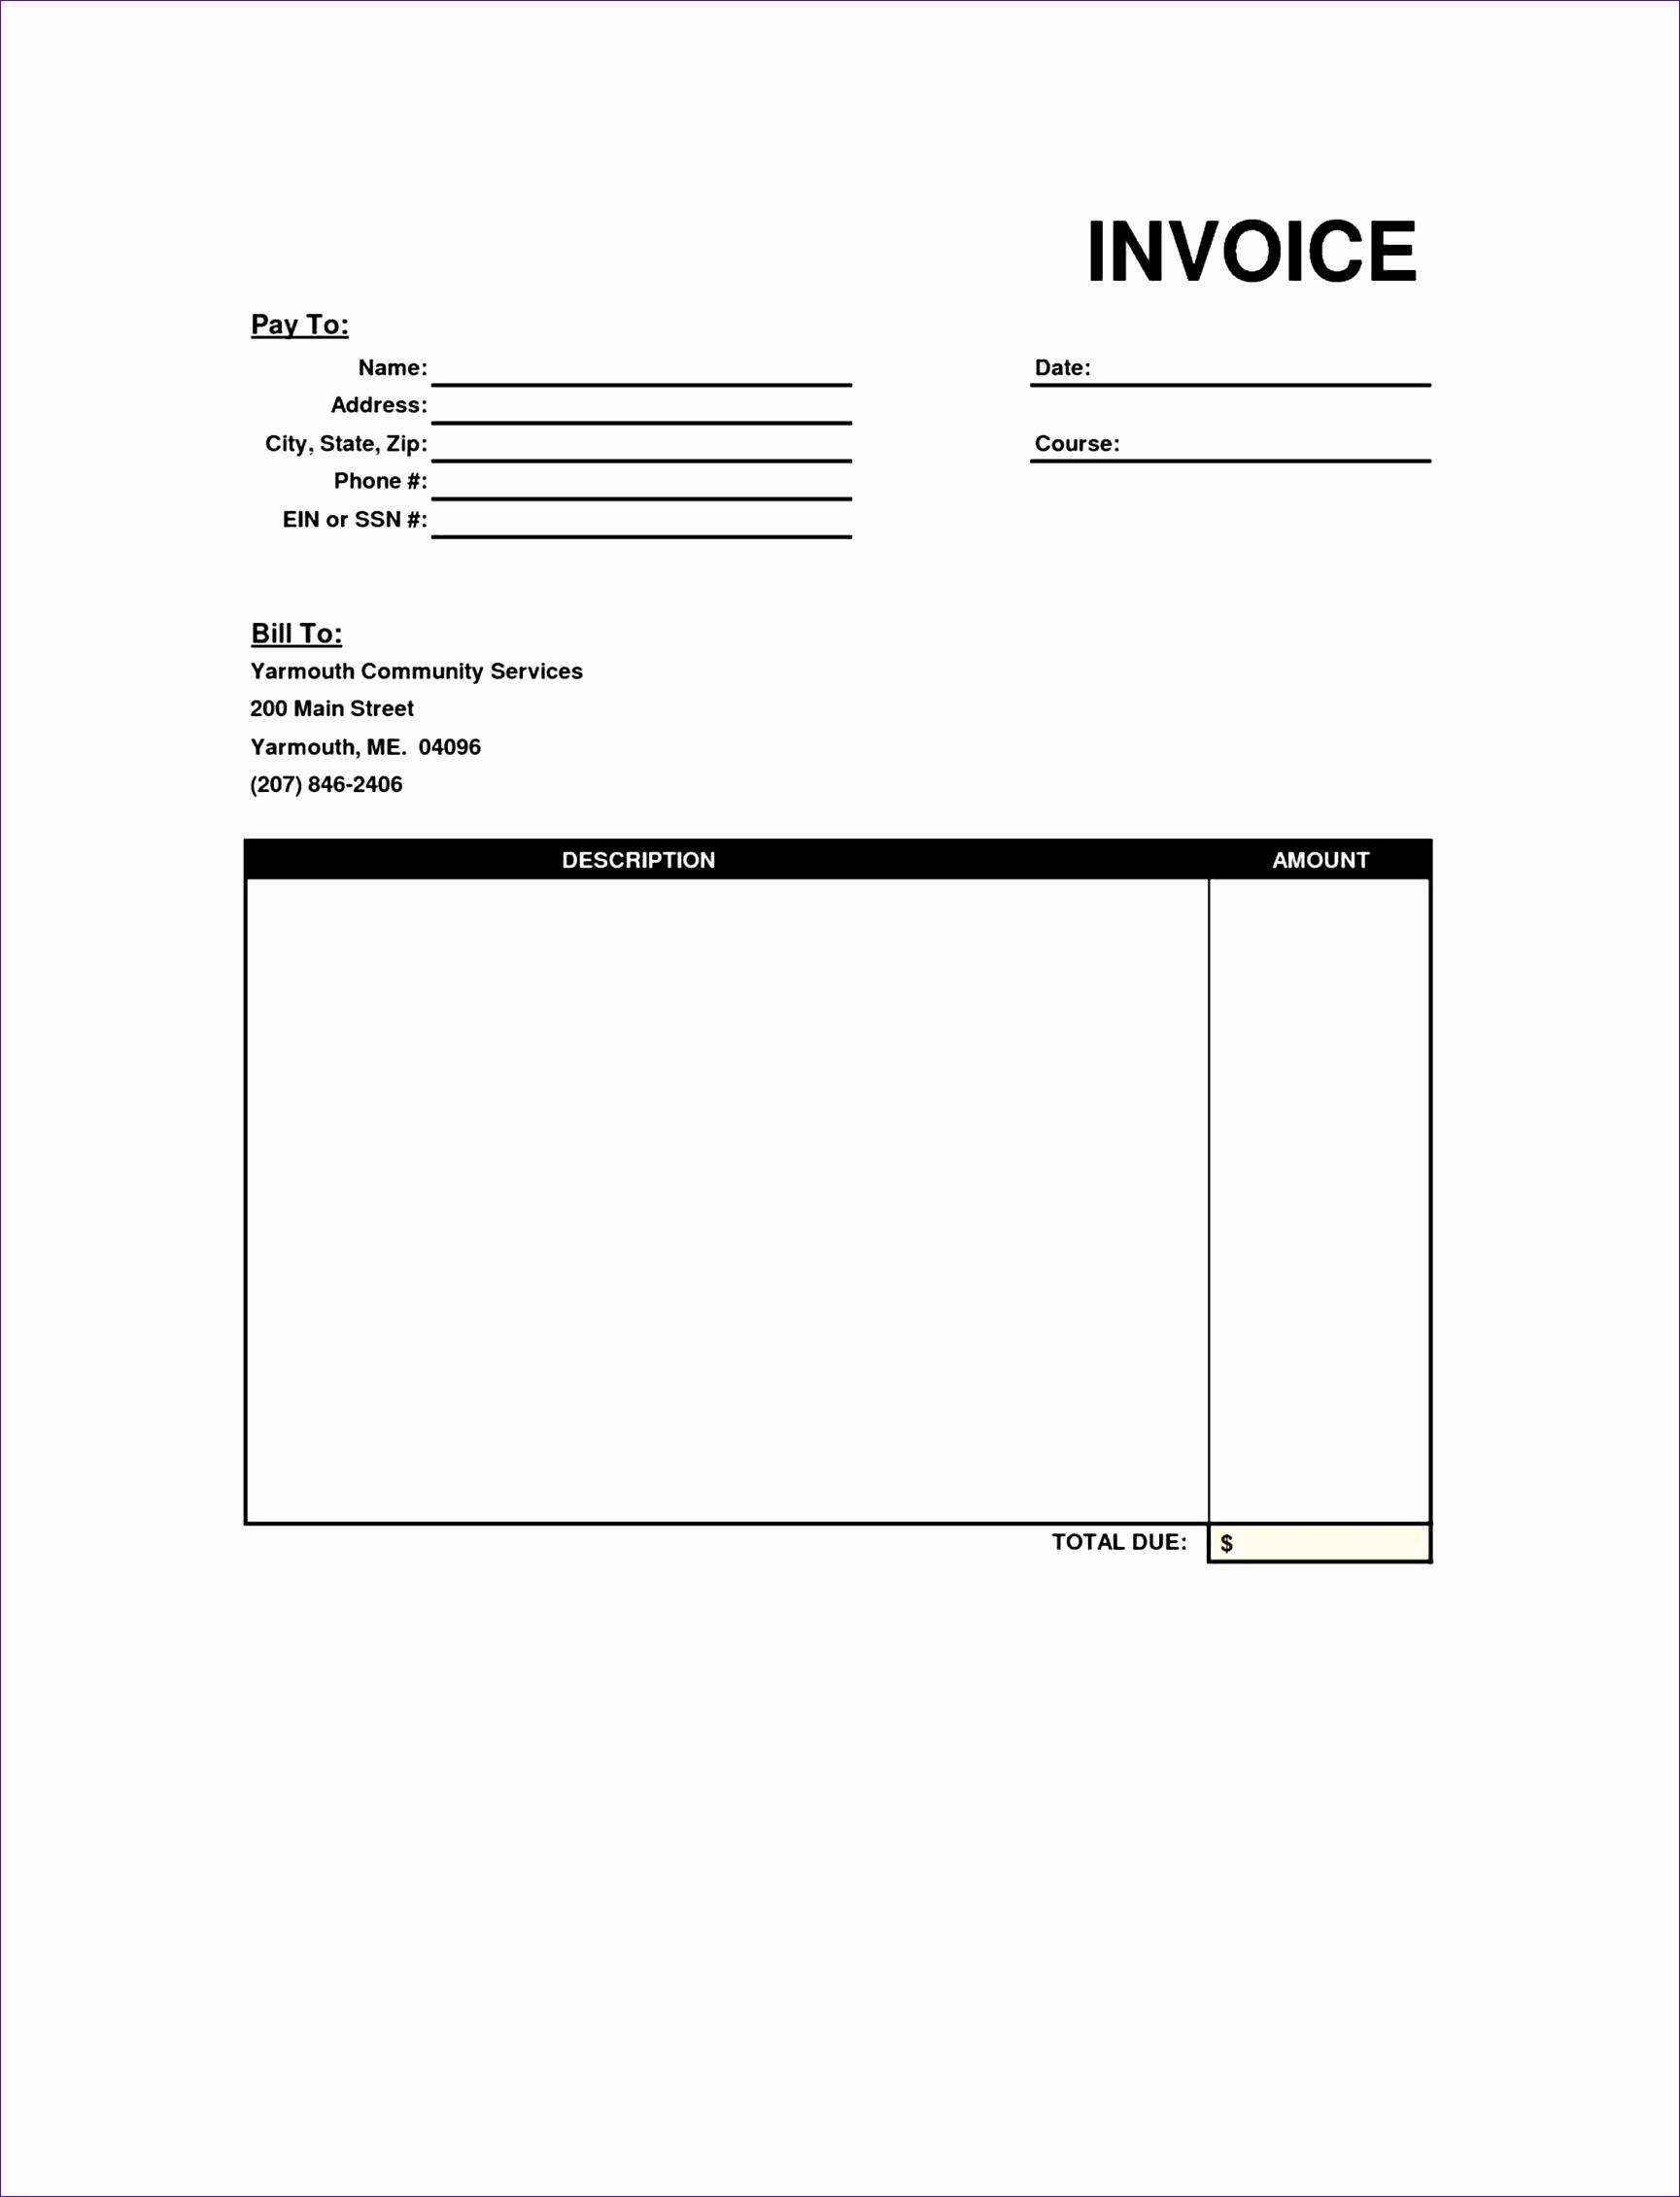 u notators formilesinfo simple Services Invoice Template invoice template services rendered u notators formilesinfo consulting example ideas consulting Services Invoice Template invoice